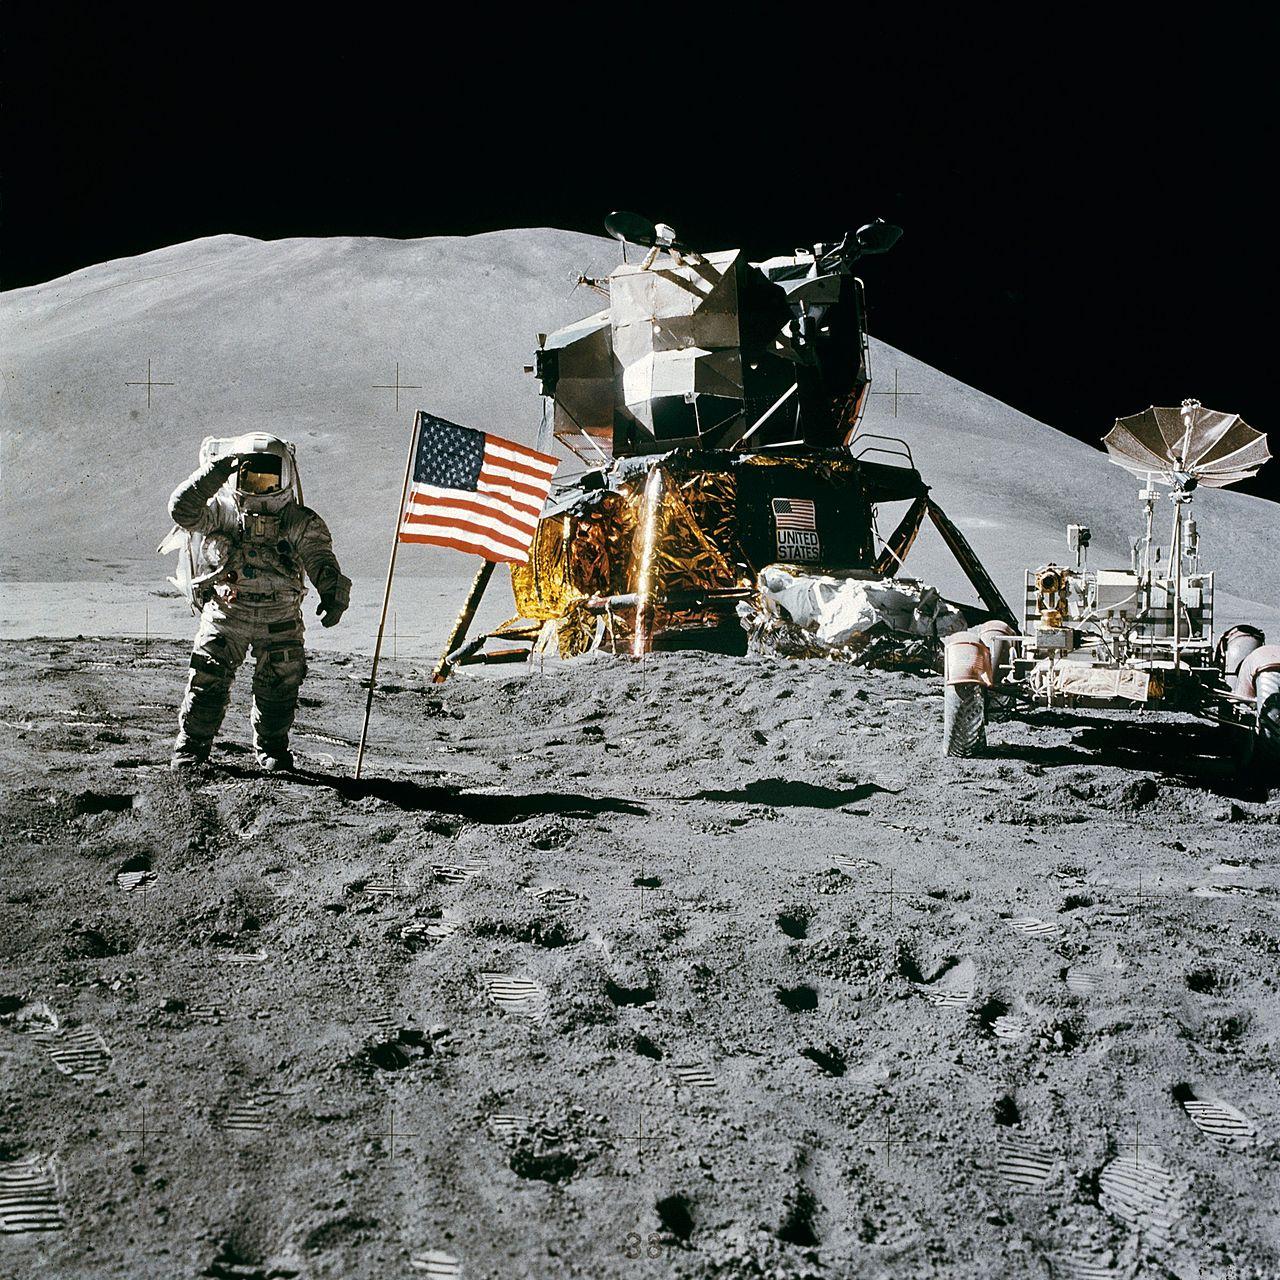 1280px-Apollo_15_flag,_rover,_LM,_Irwin.jpg